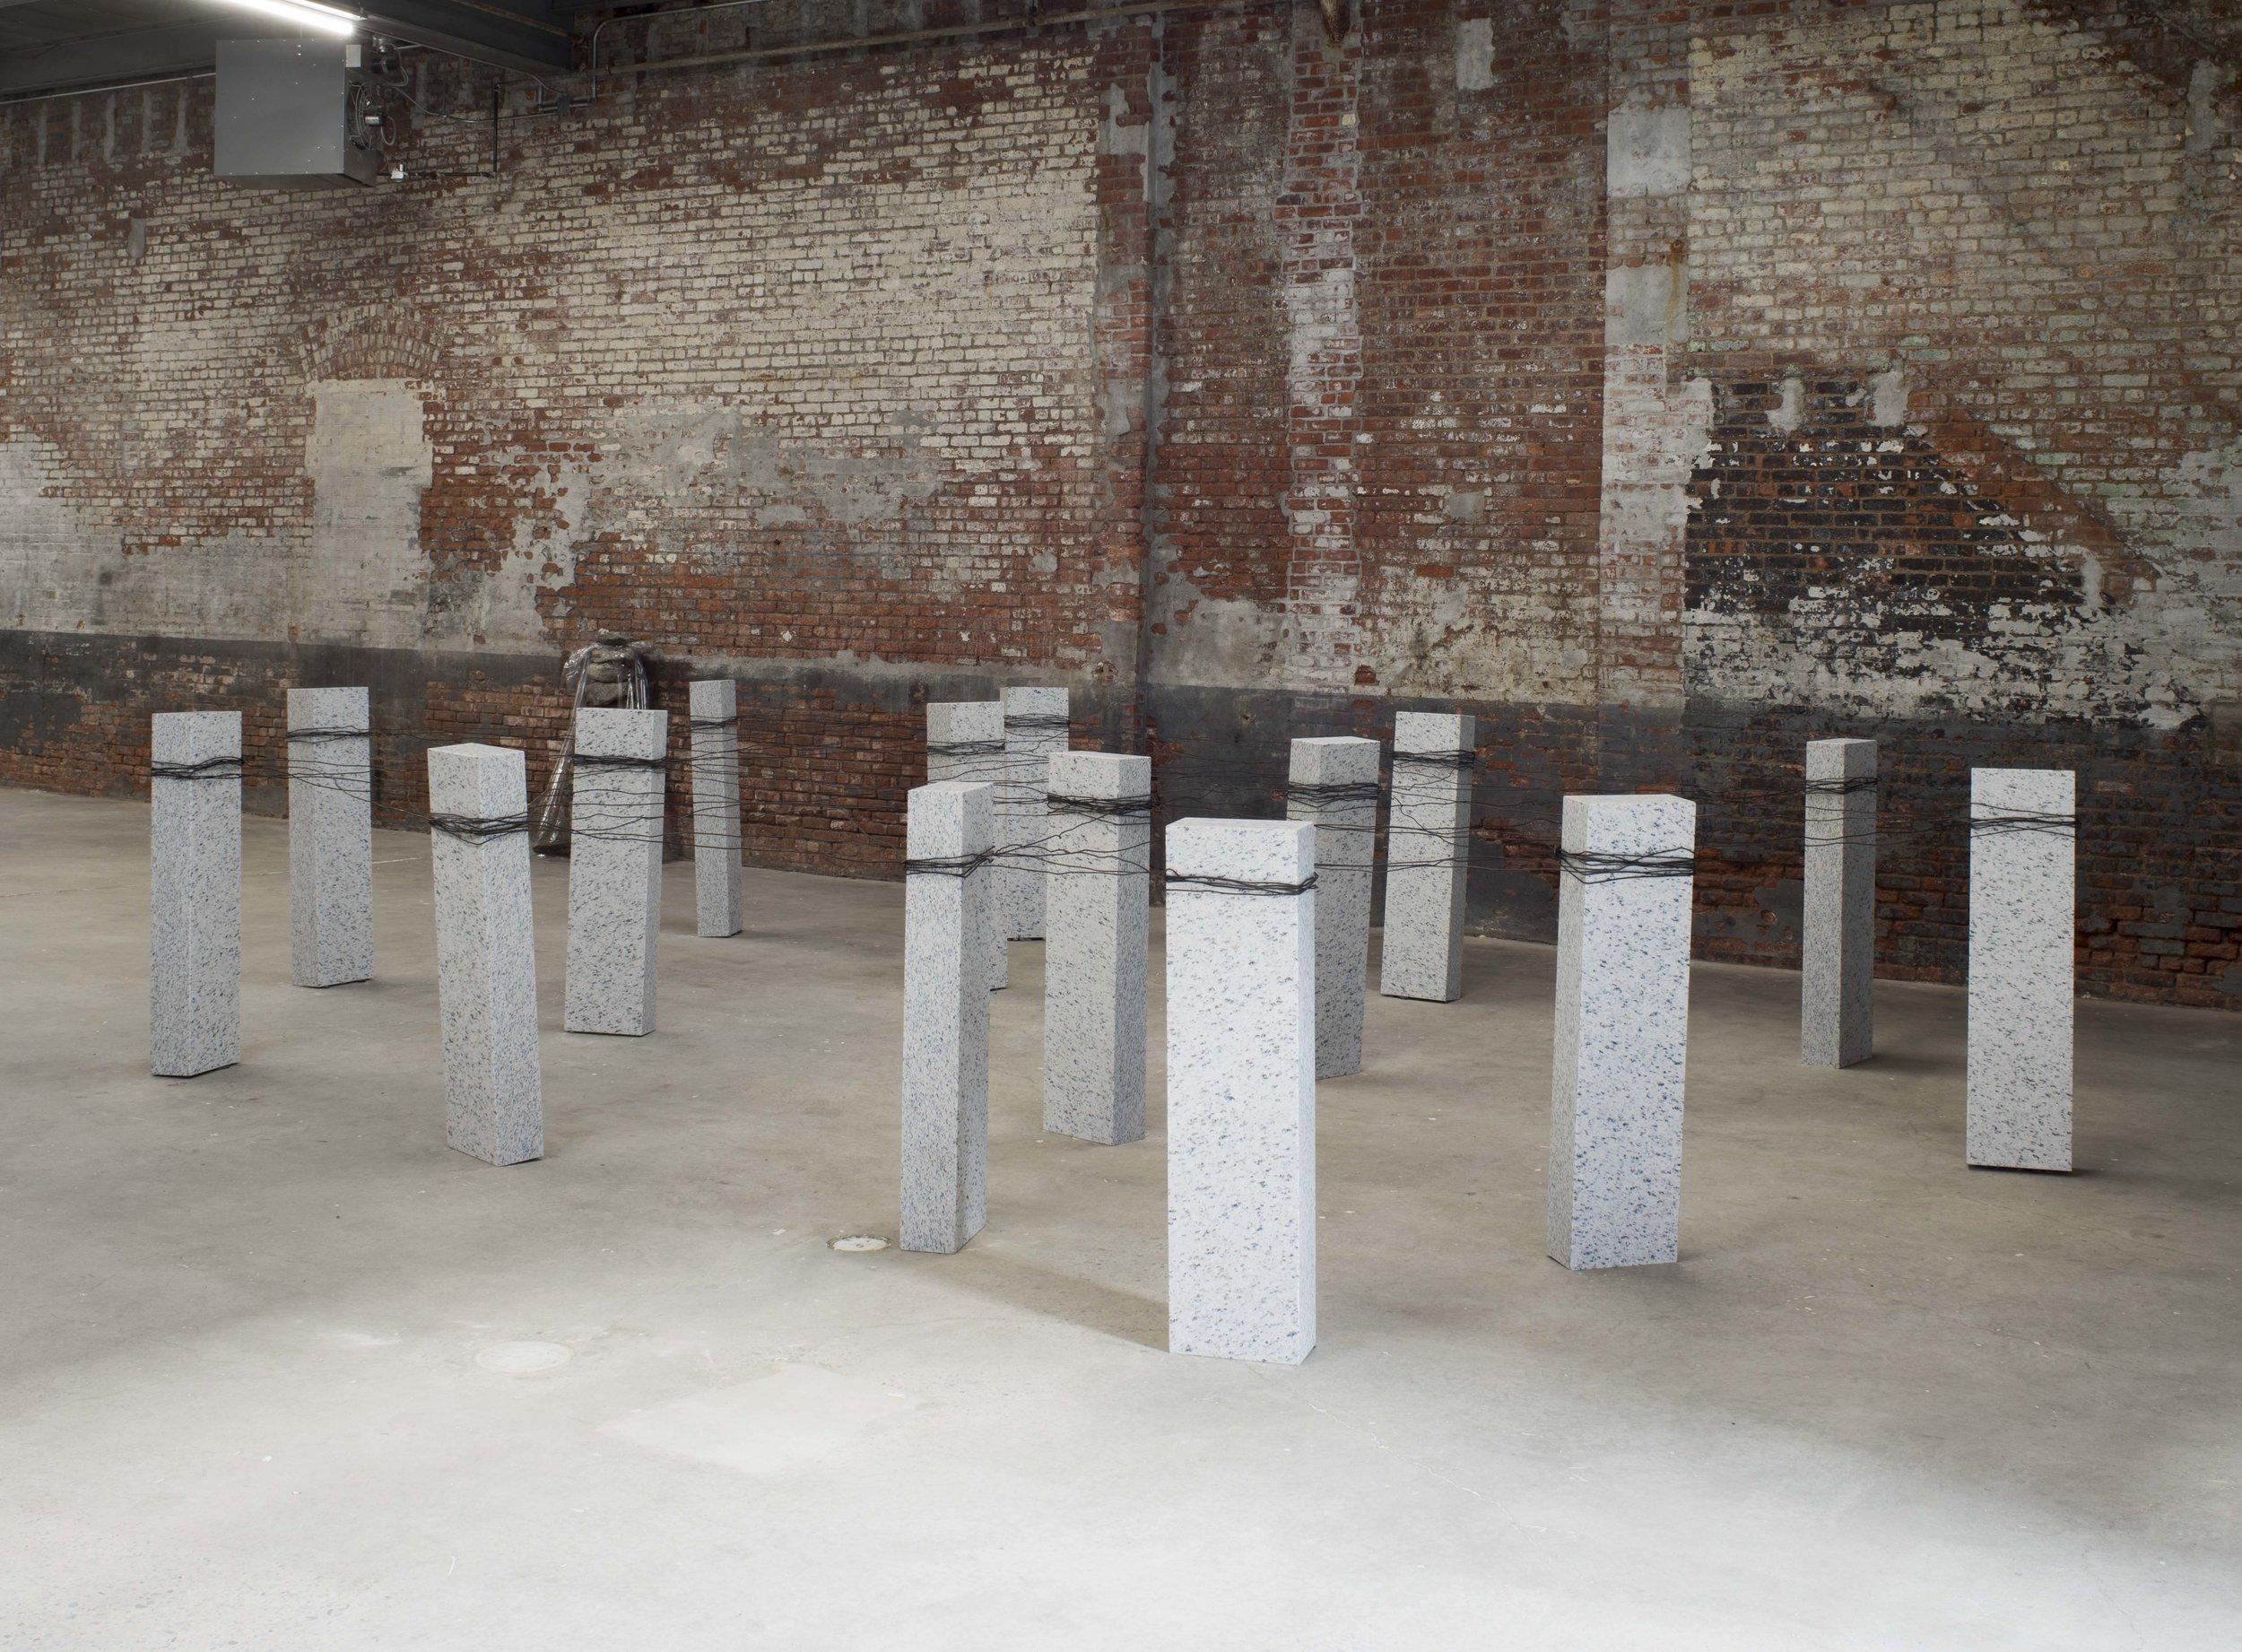 Placement of Condition, 1973/2016 状況置 (J ōkyōchi ) Granite, wire Dimensions variable Installation view, Kishio Suga ,Dia:Chelsea, New York, NY, 2016 Photo:Bill Jacobson Studio, New York Courtesy Dia Art Foundation, New York